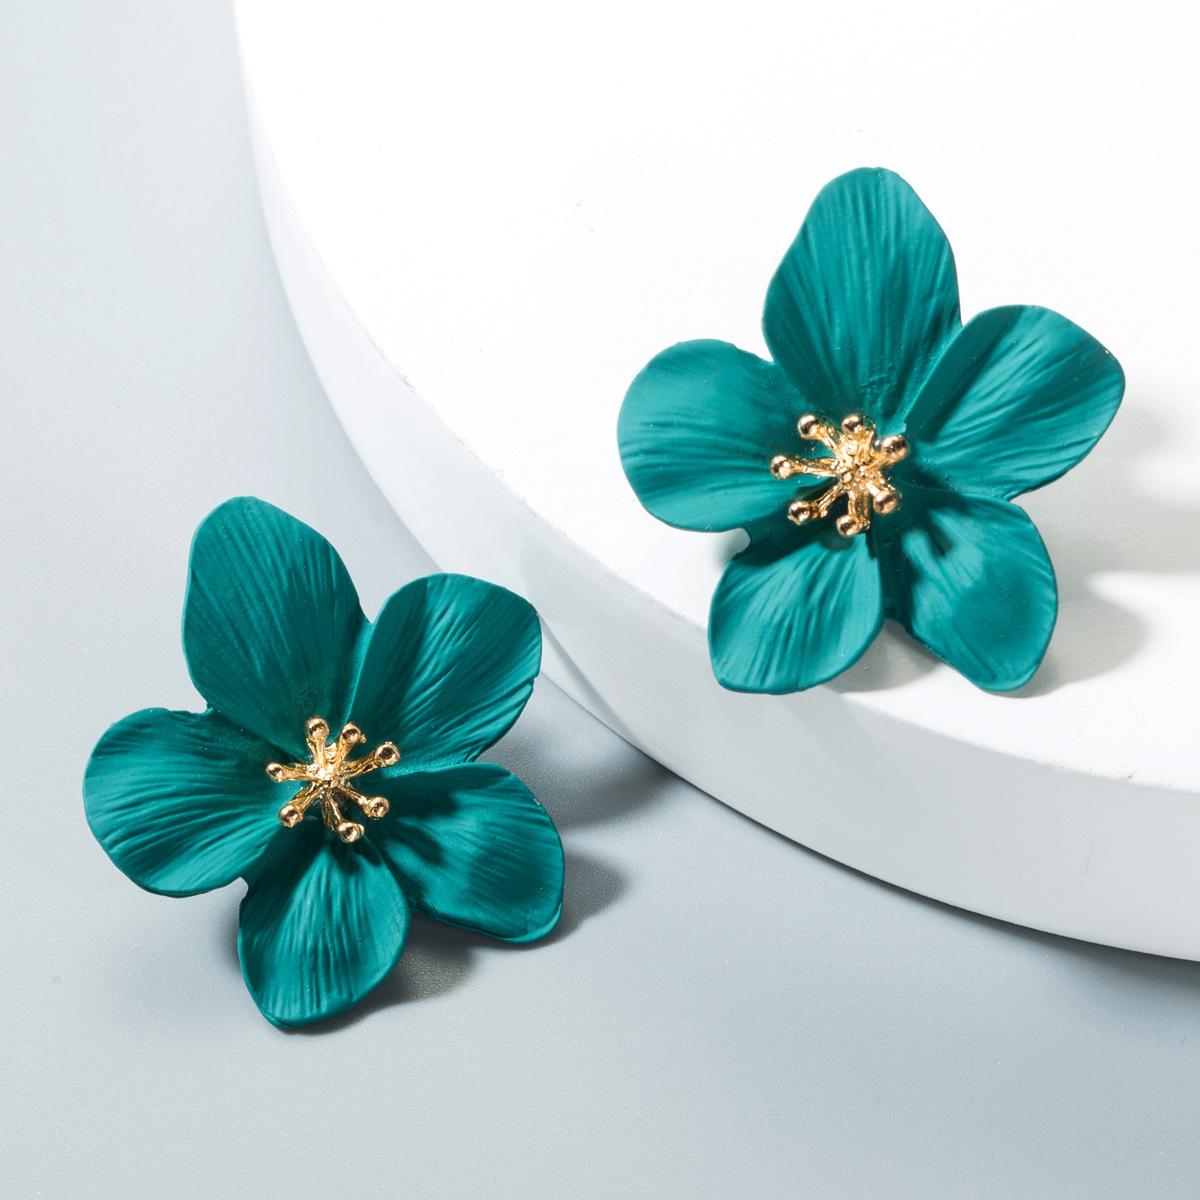 Fashion yellow small fresh petal alloy earrings NHLN152129